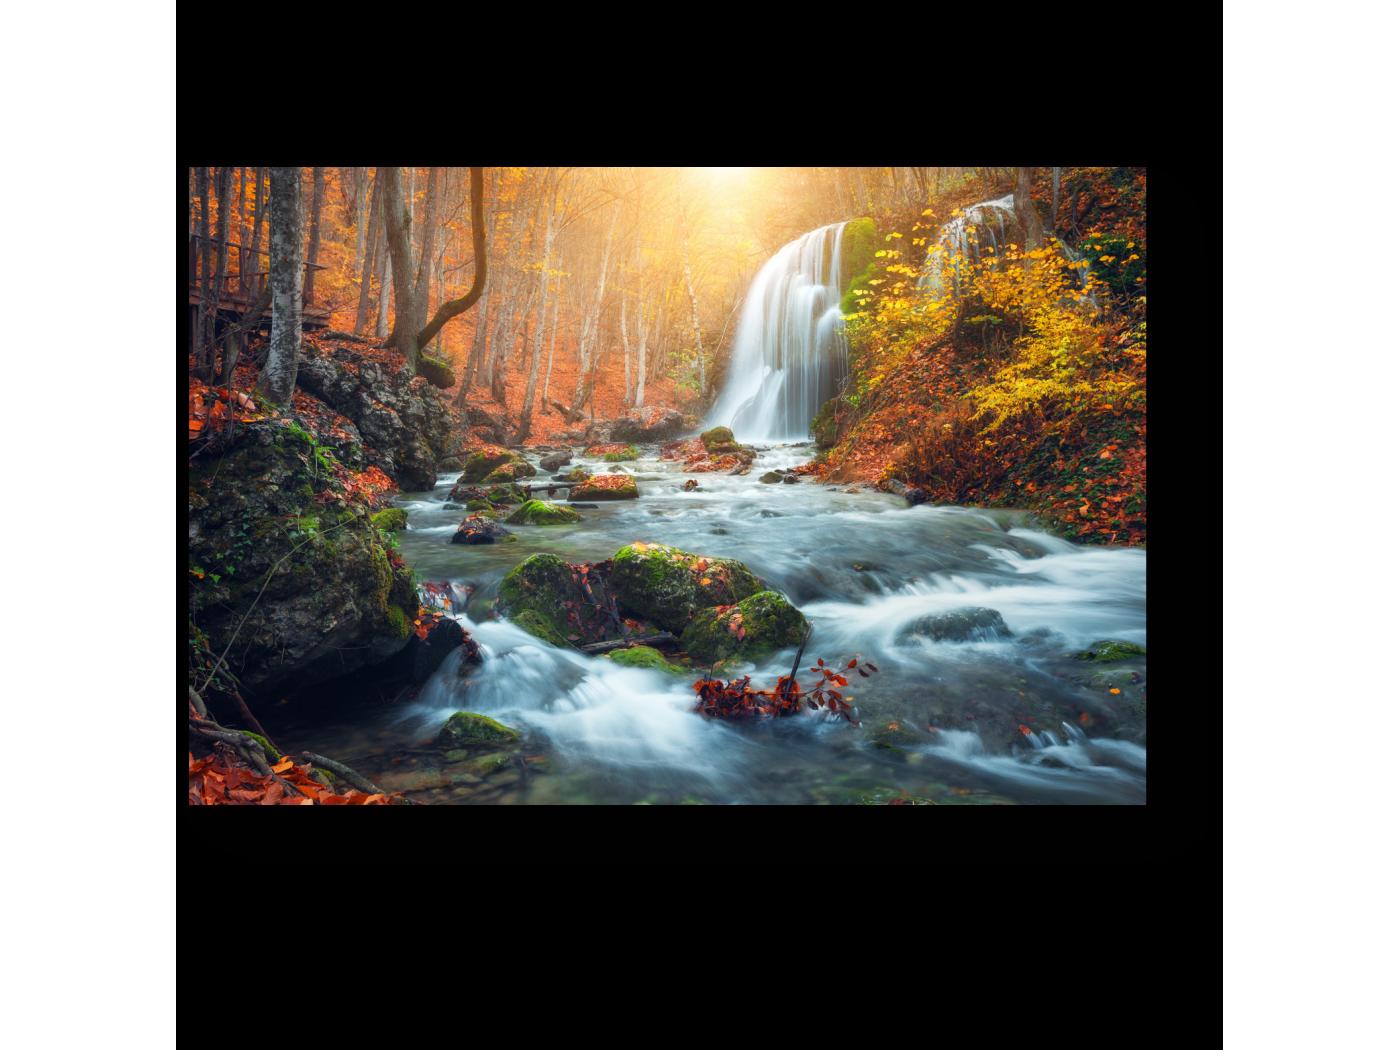 Модульная картина Прекрасный осенний водопад (30x20) фото